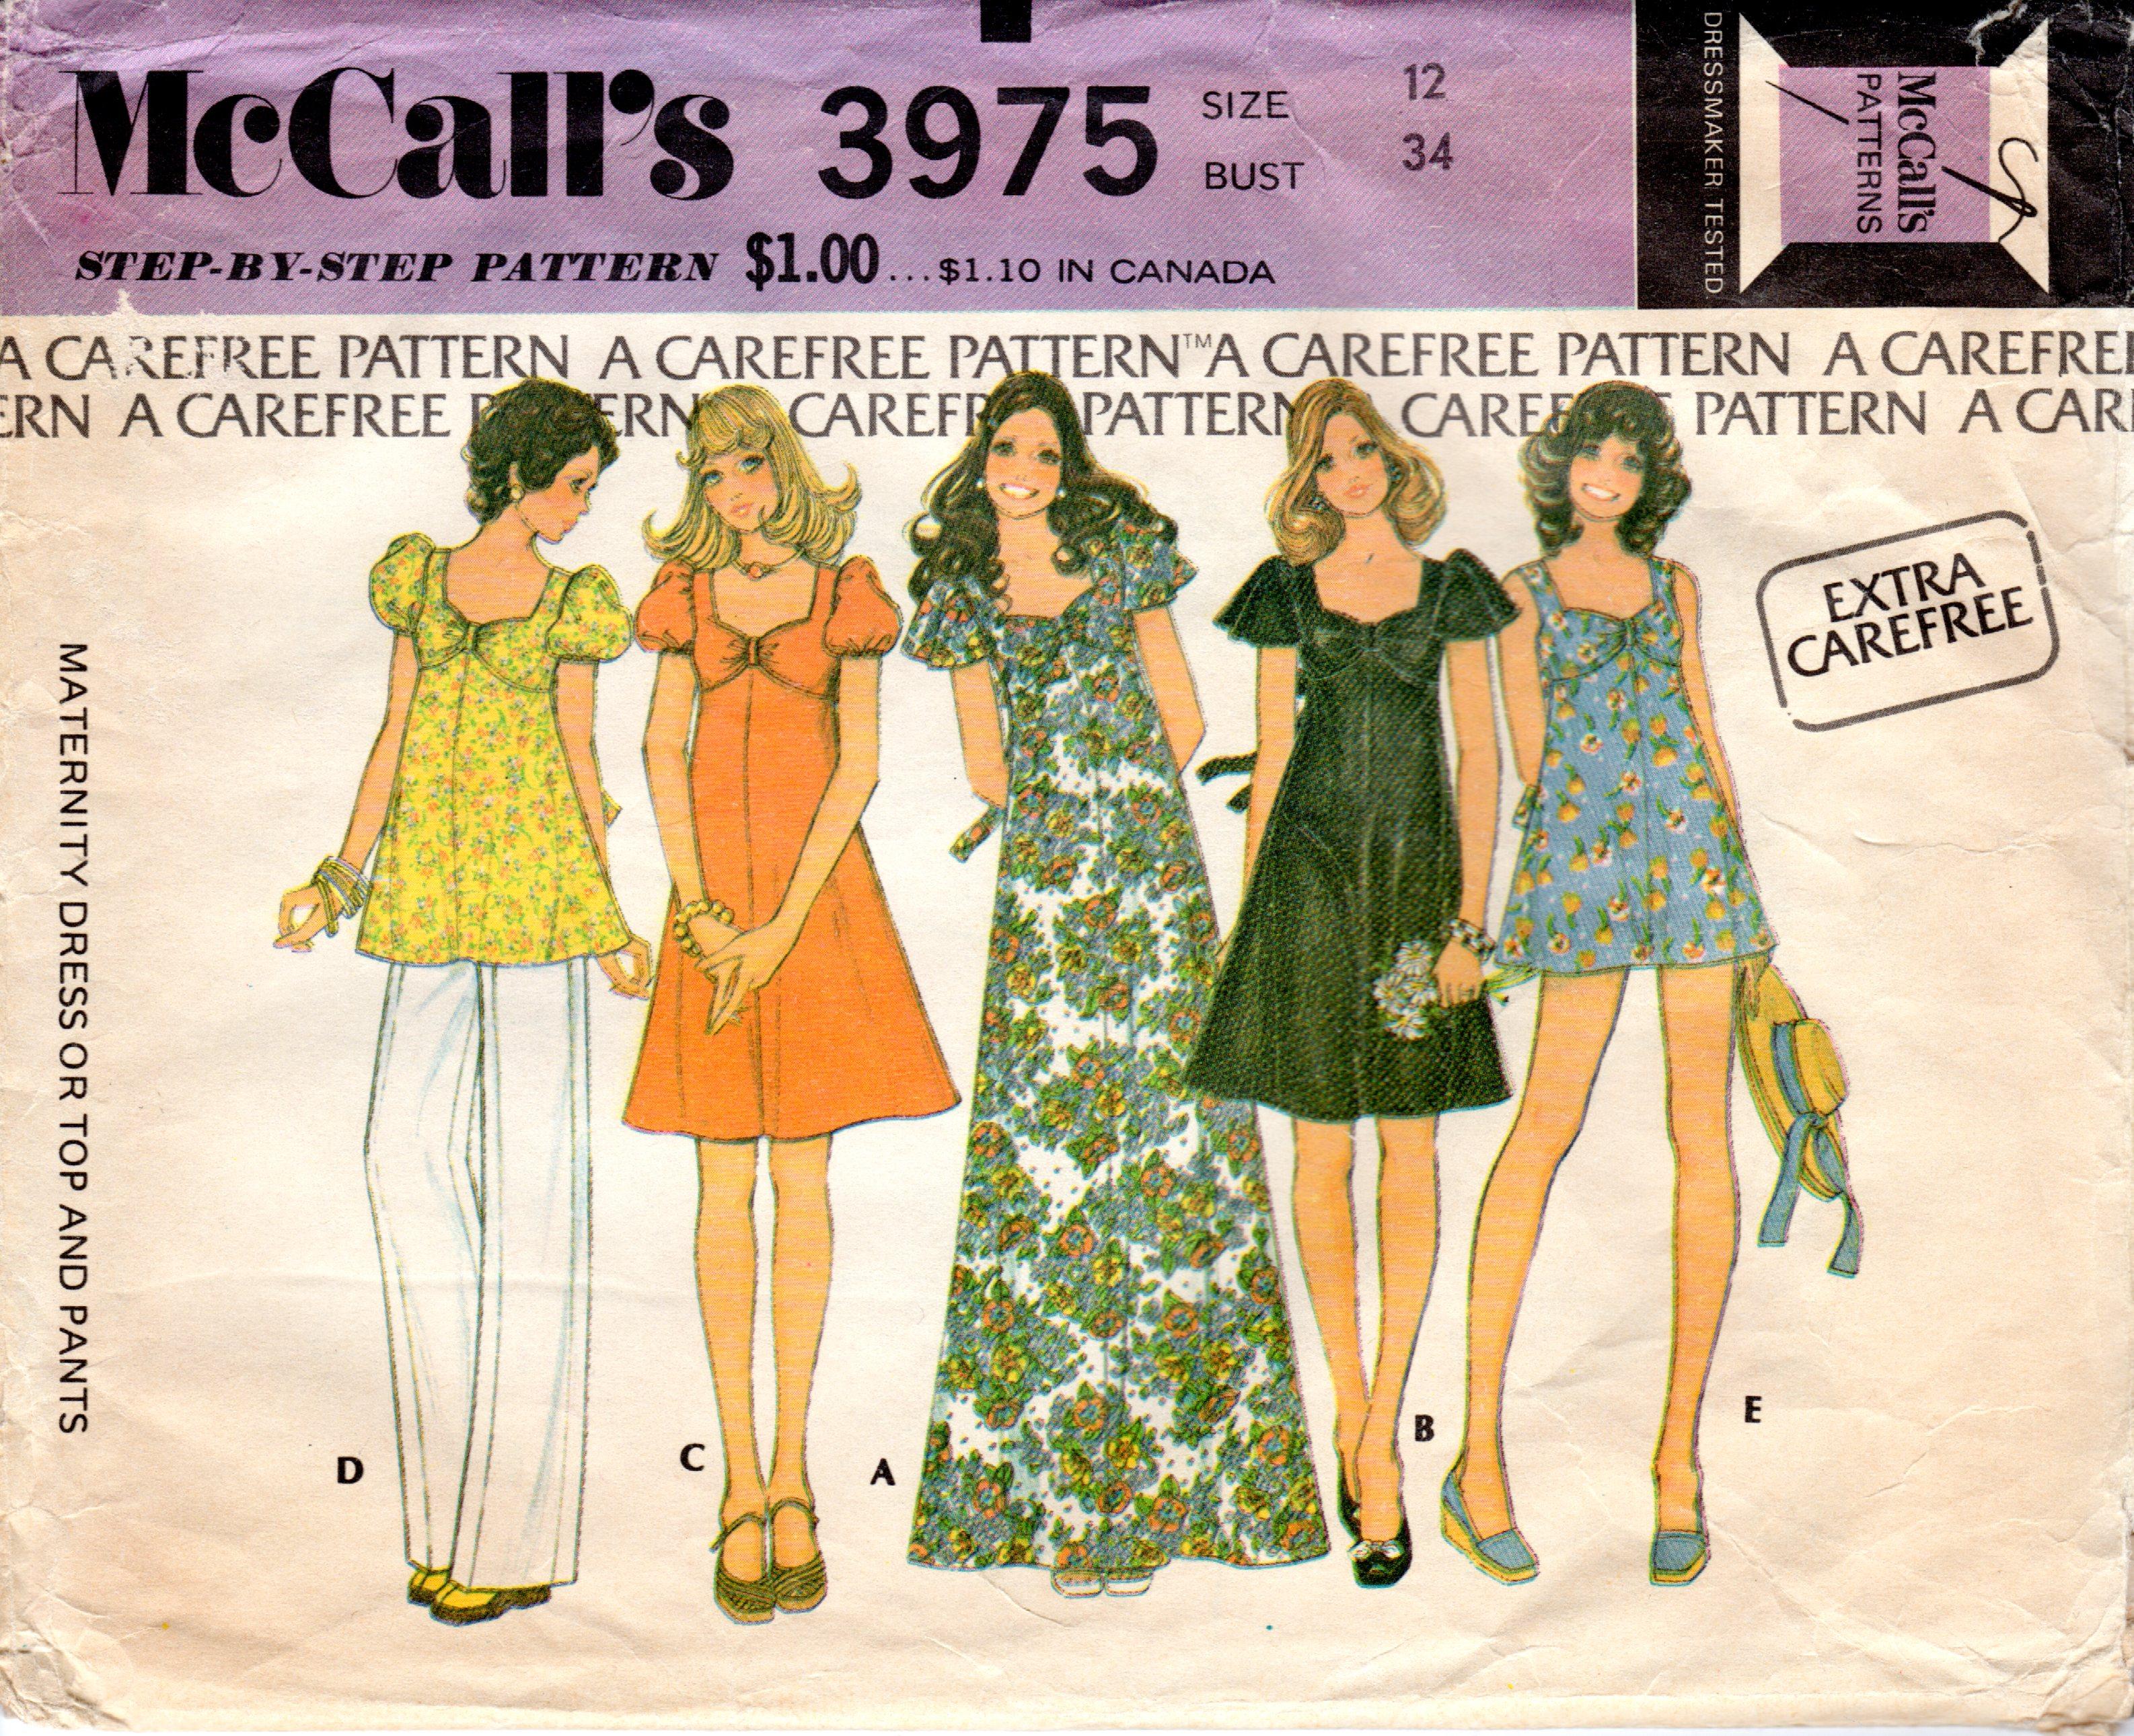 McCall's 3975